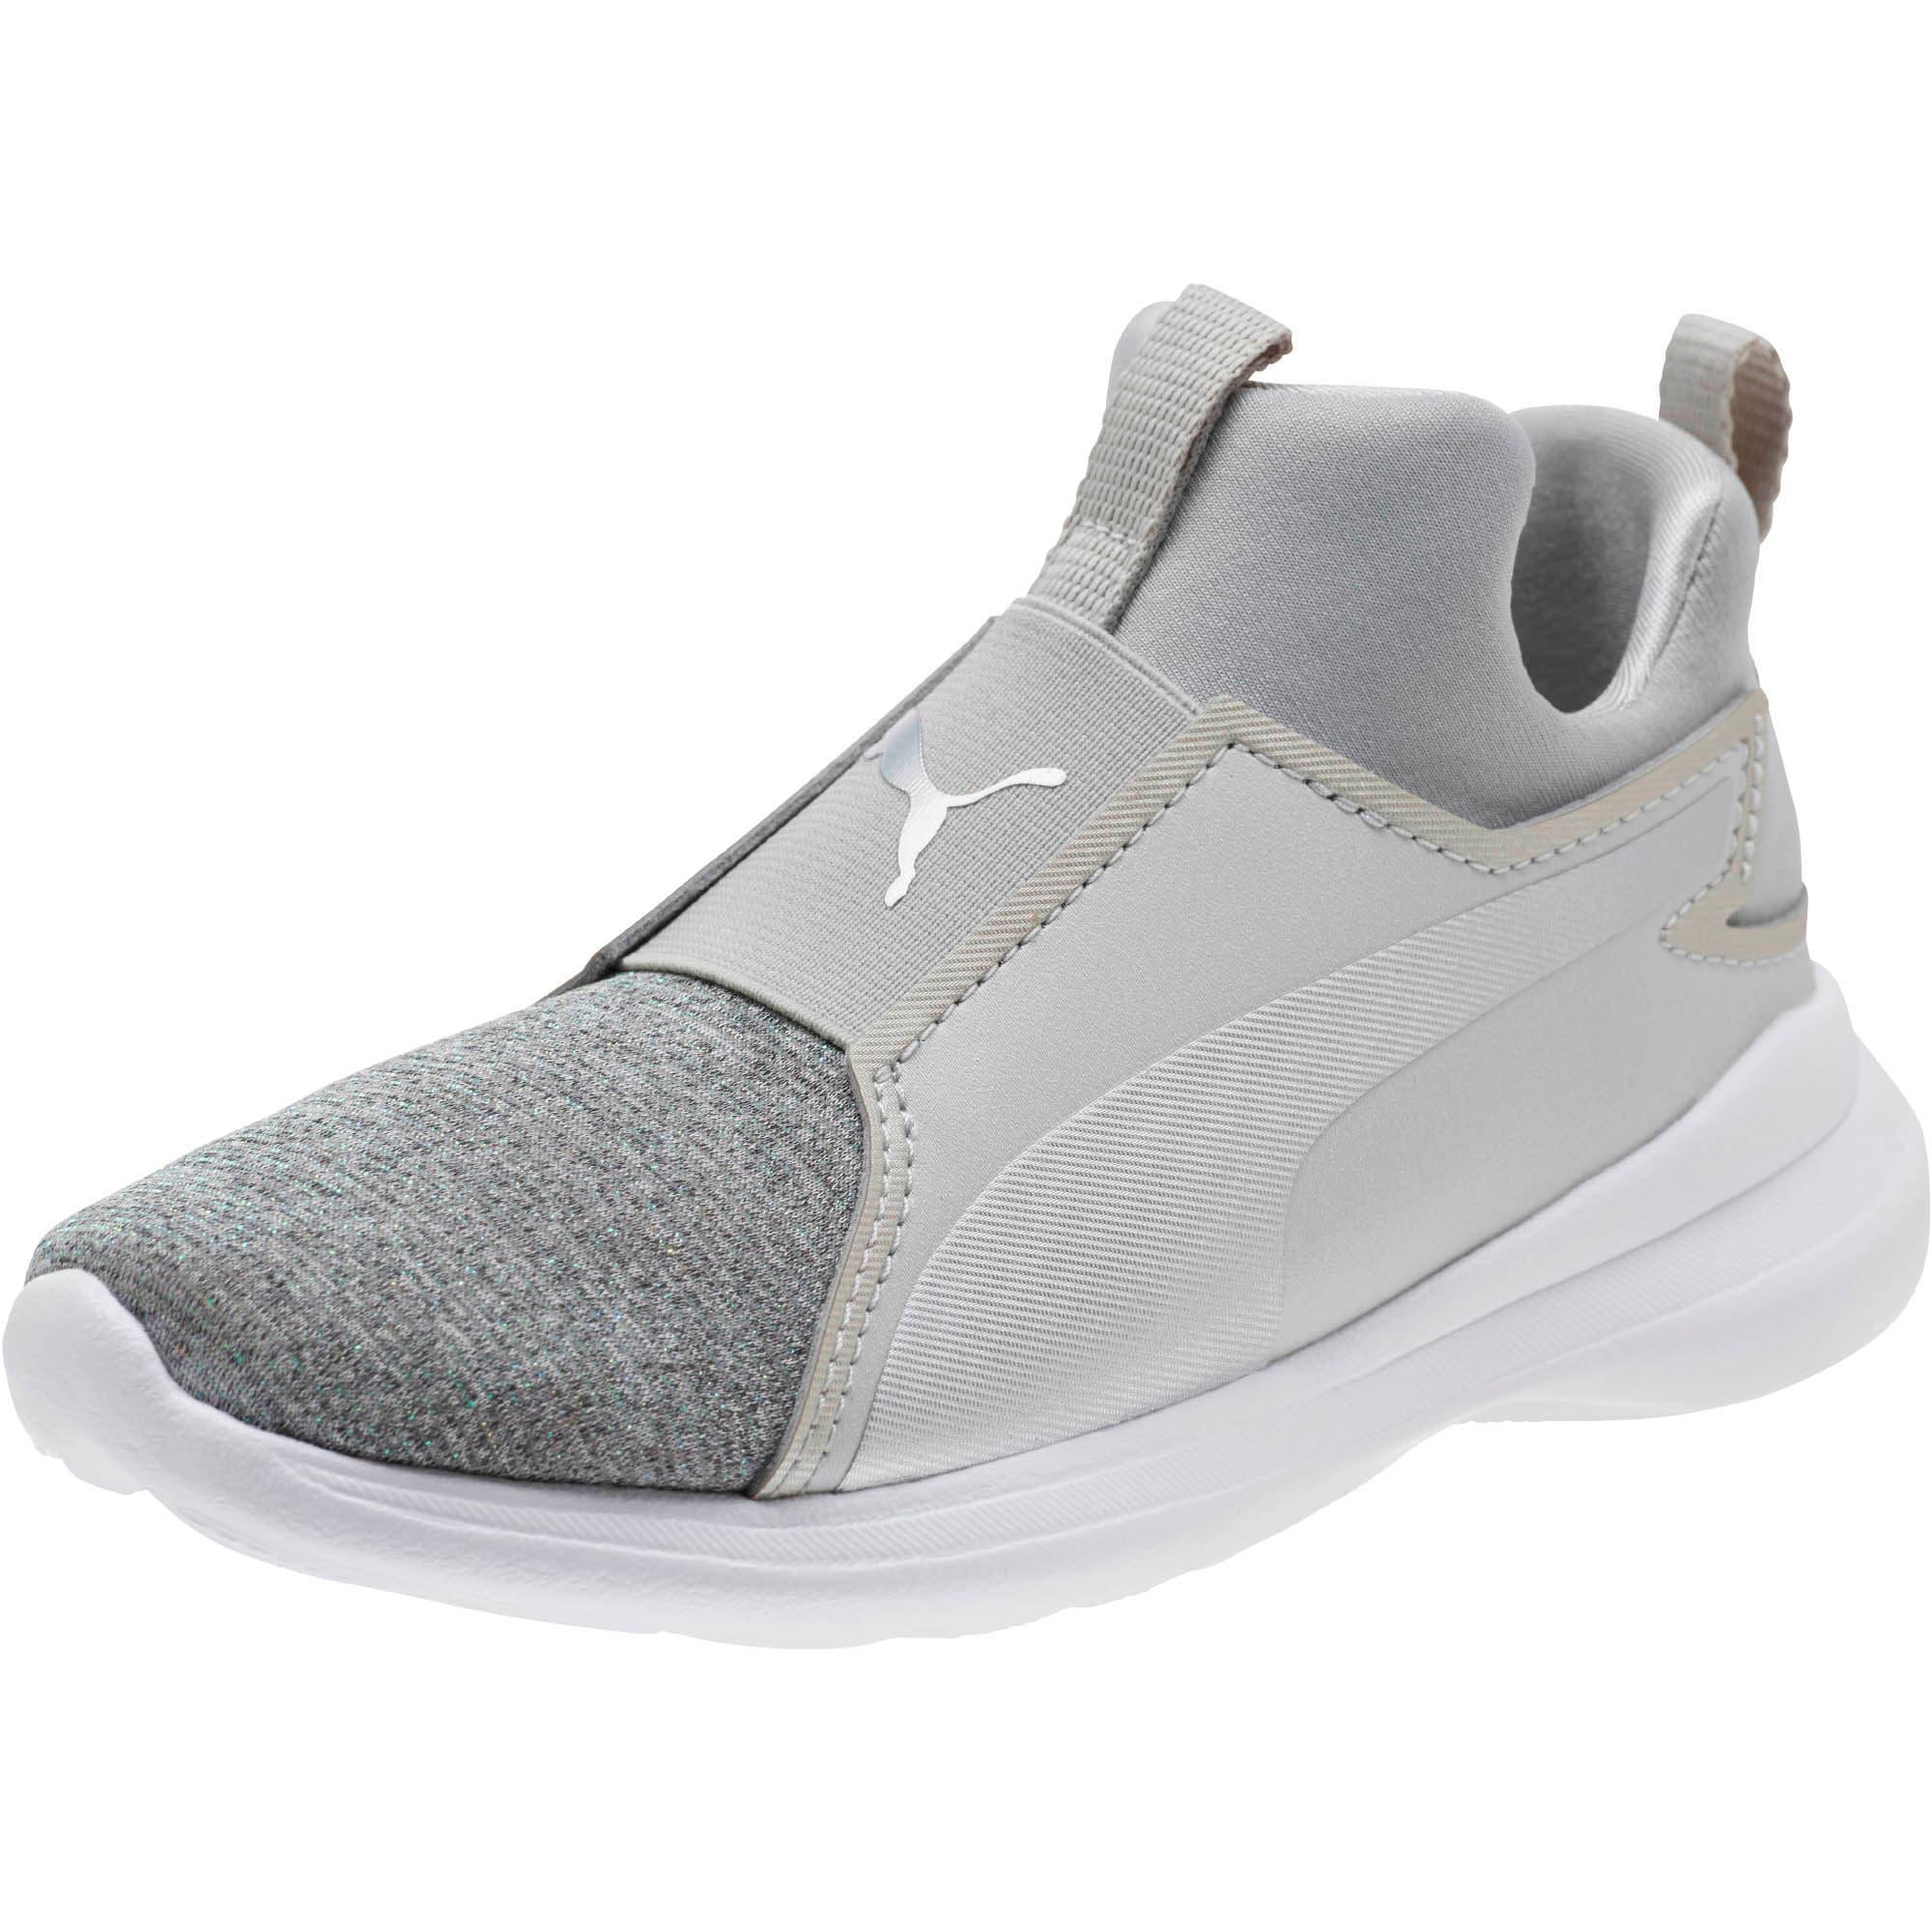 Thumbnail 1 of Puma Rebel Mid Glow Little Kids' Shoes, Gray Violet-Puma Silver, medium